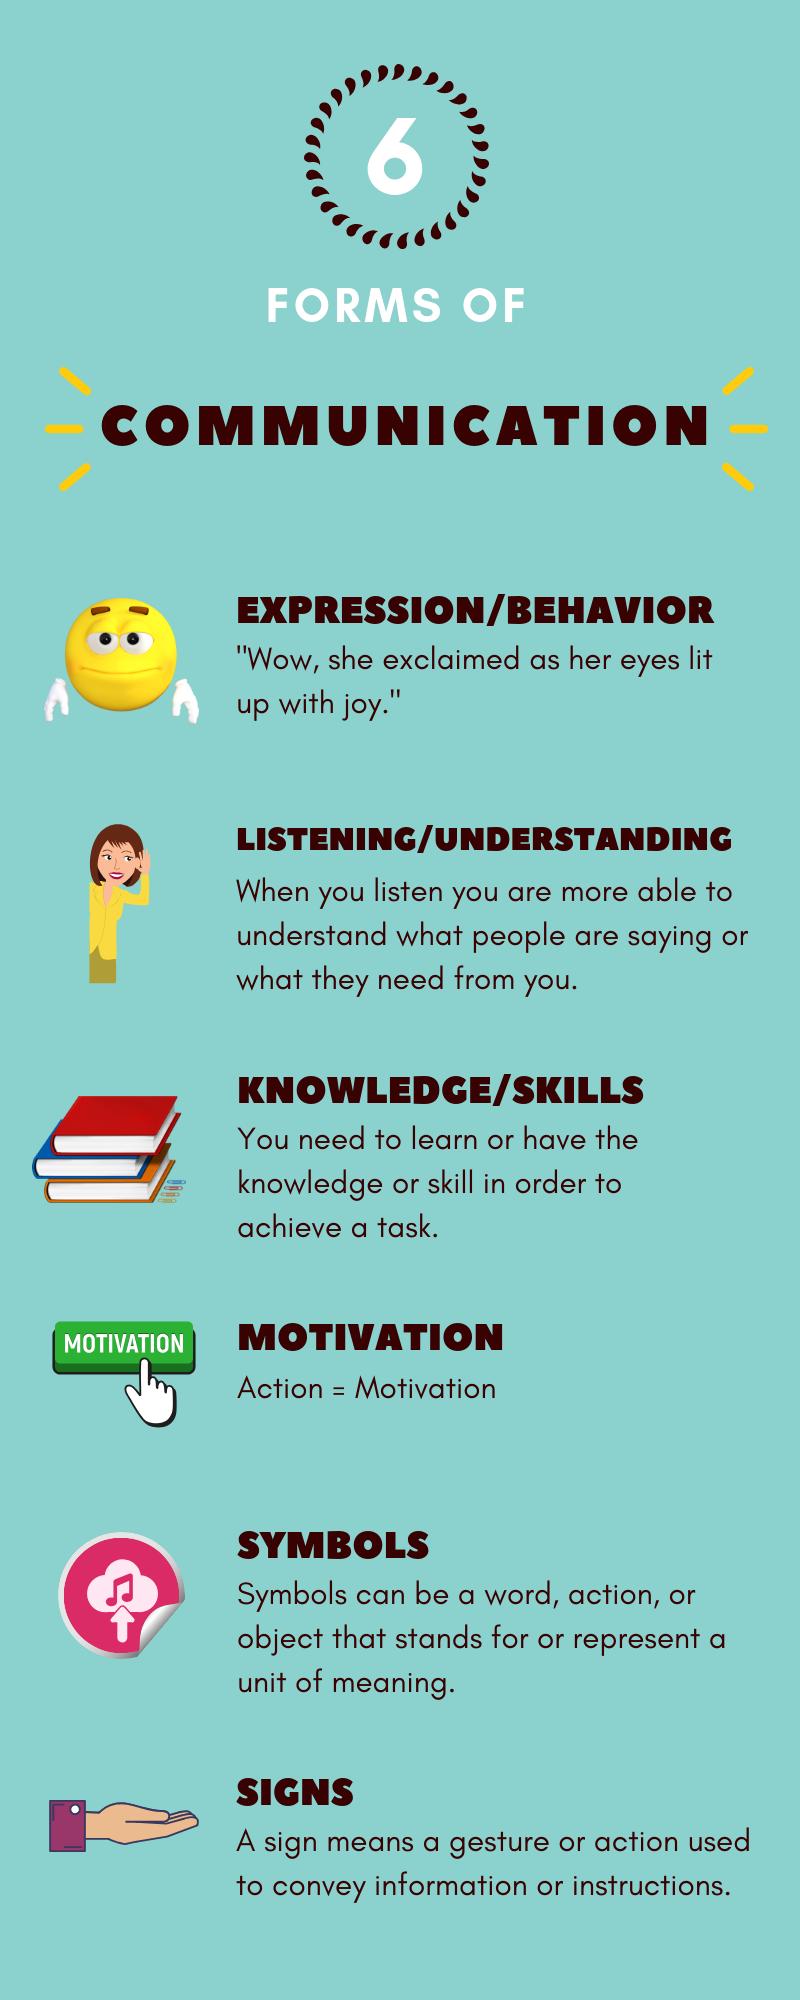 Communication Skills In Today S World Heather Earles Communication Skills What Is Communication Communication